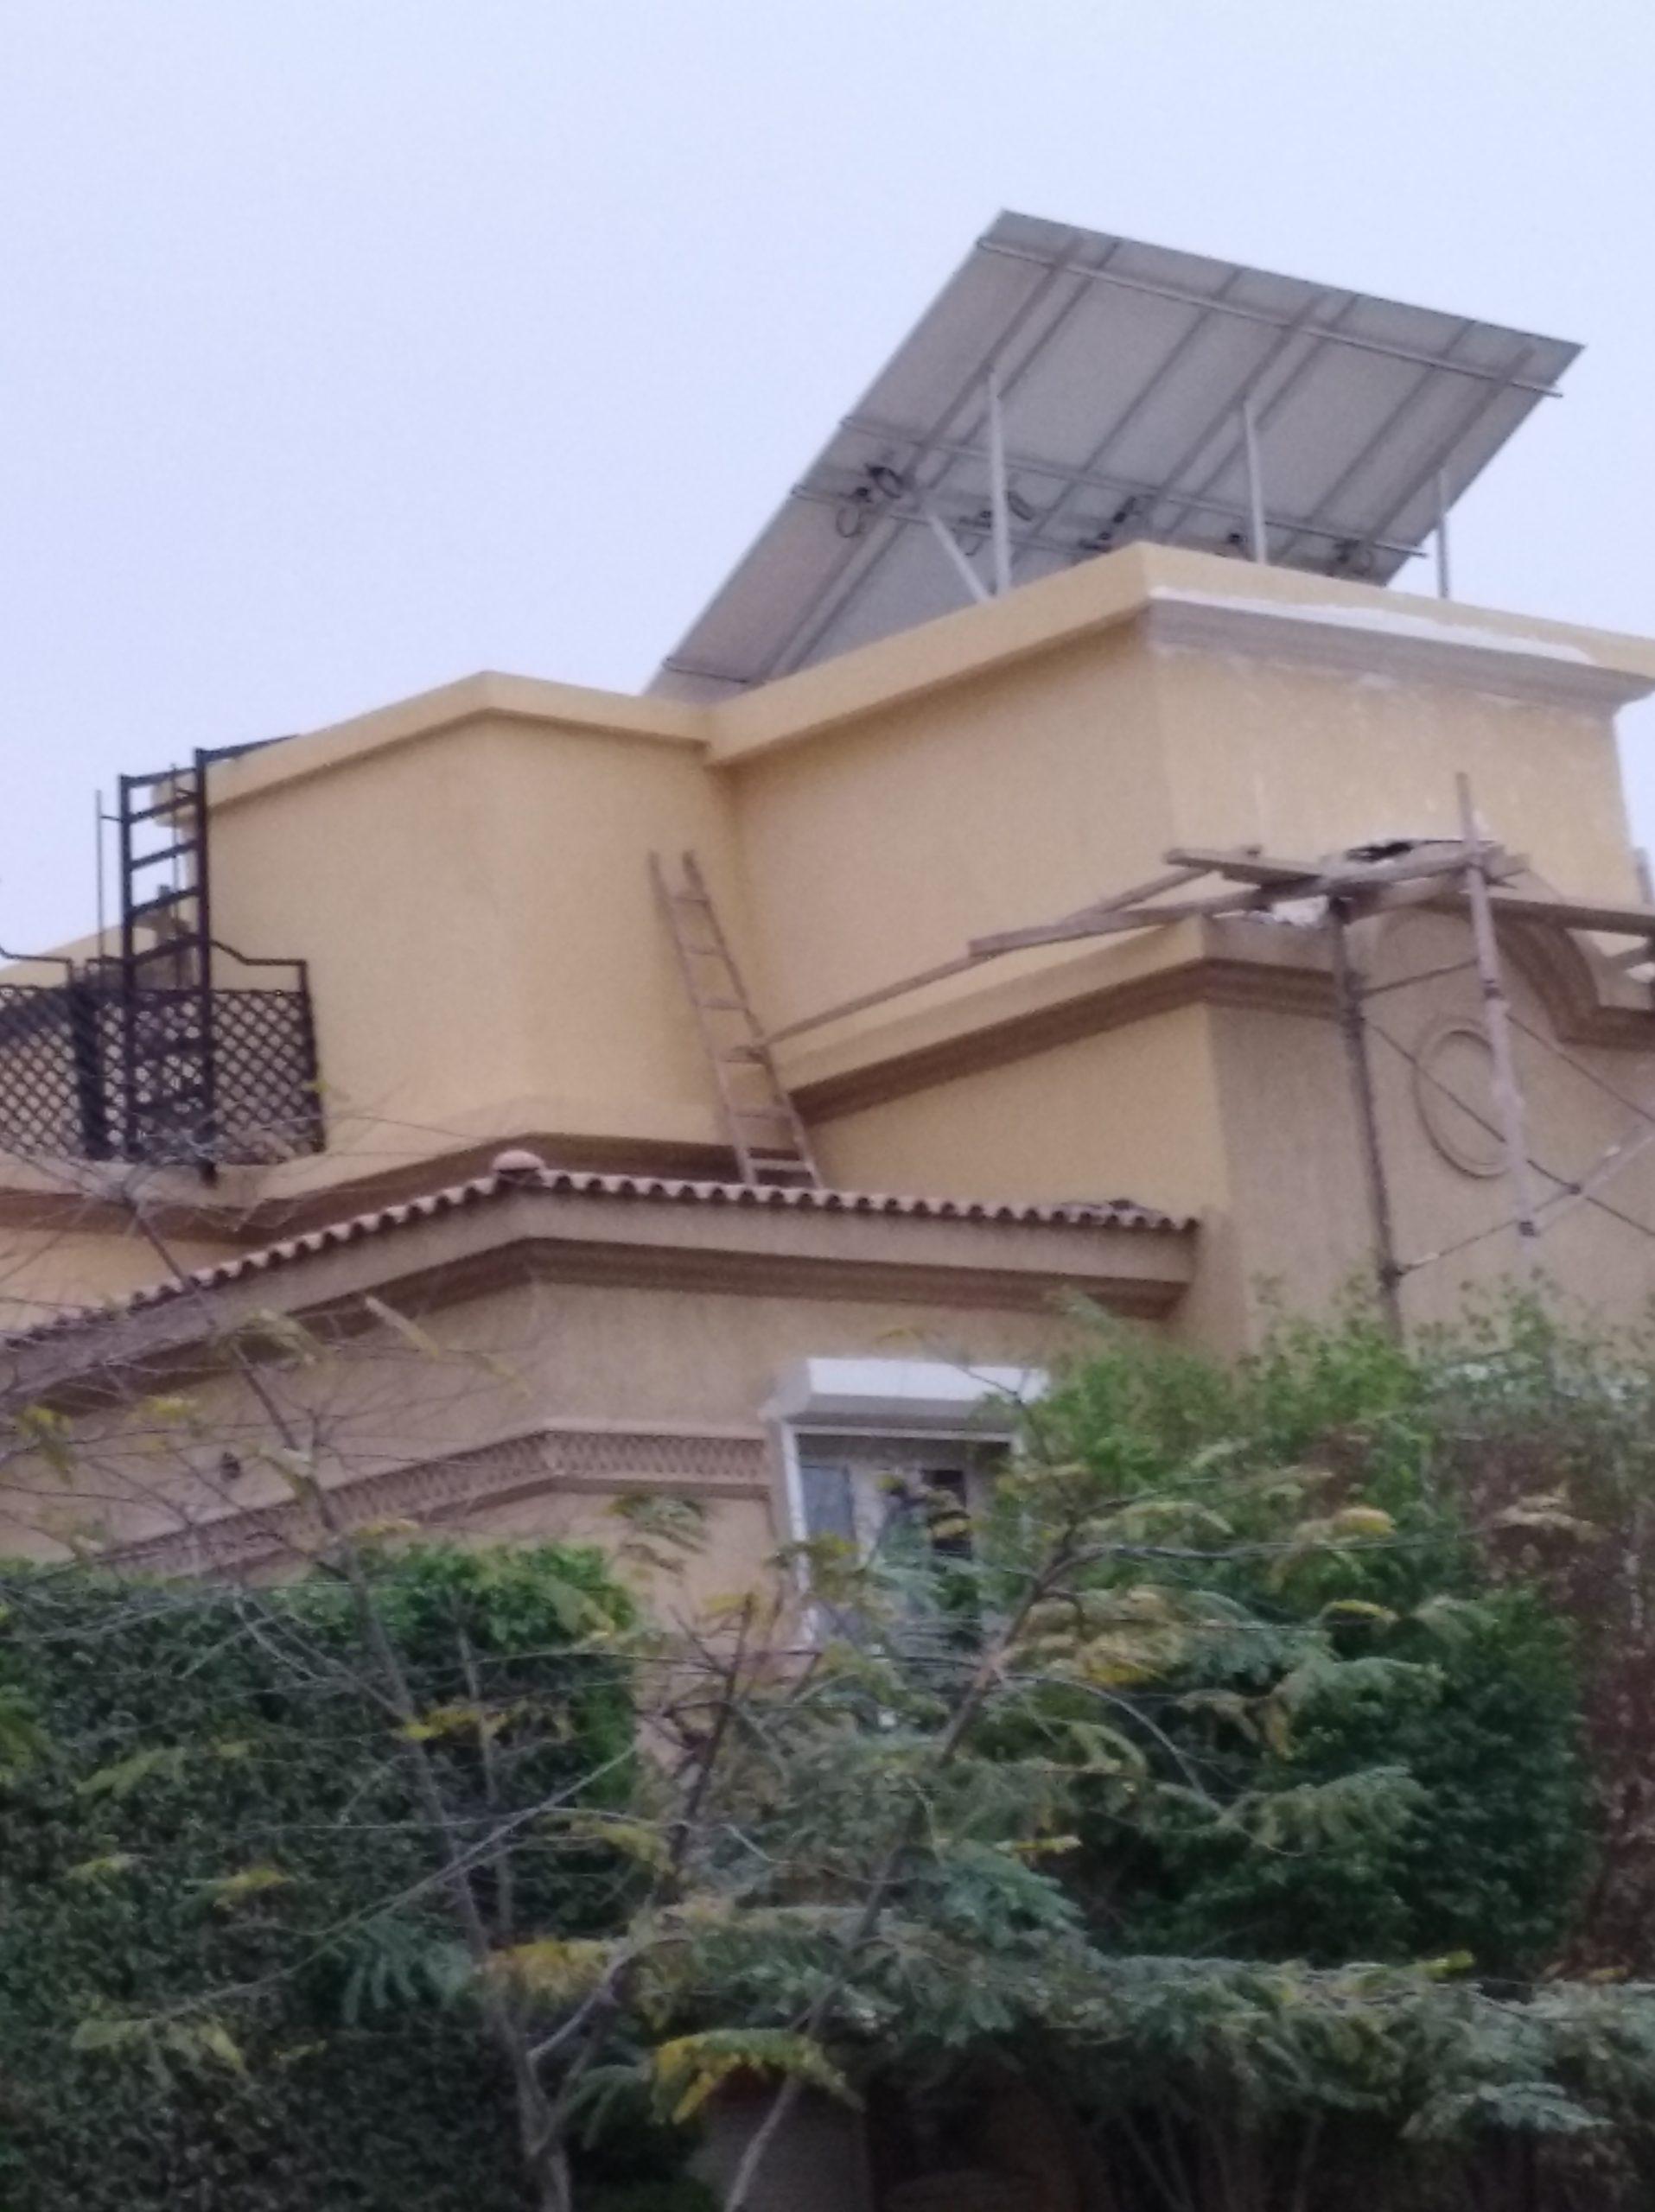 مشروع-طاقه-شمسيه-بالرحاب-12 (2)